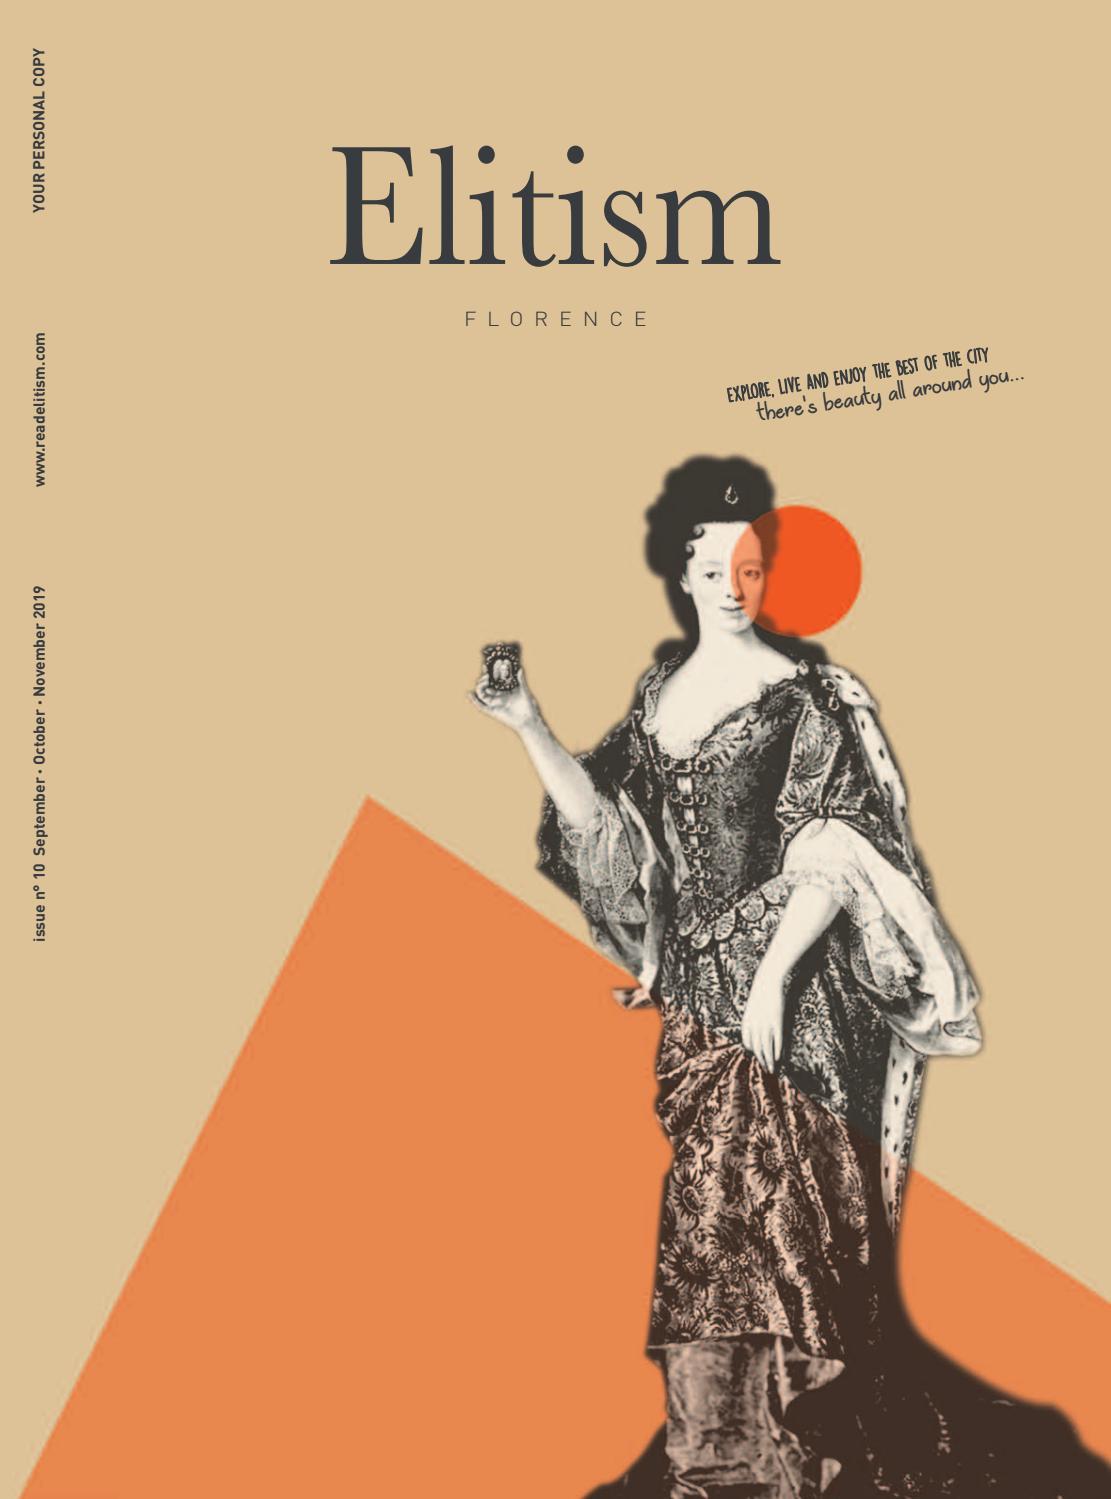 Elitism Florence ::. Issue 10 by Elitism Florence and Tuscany - issuu